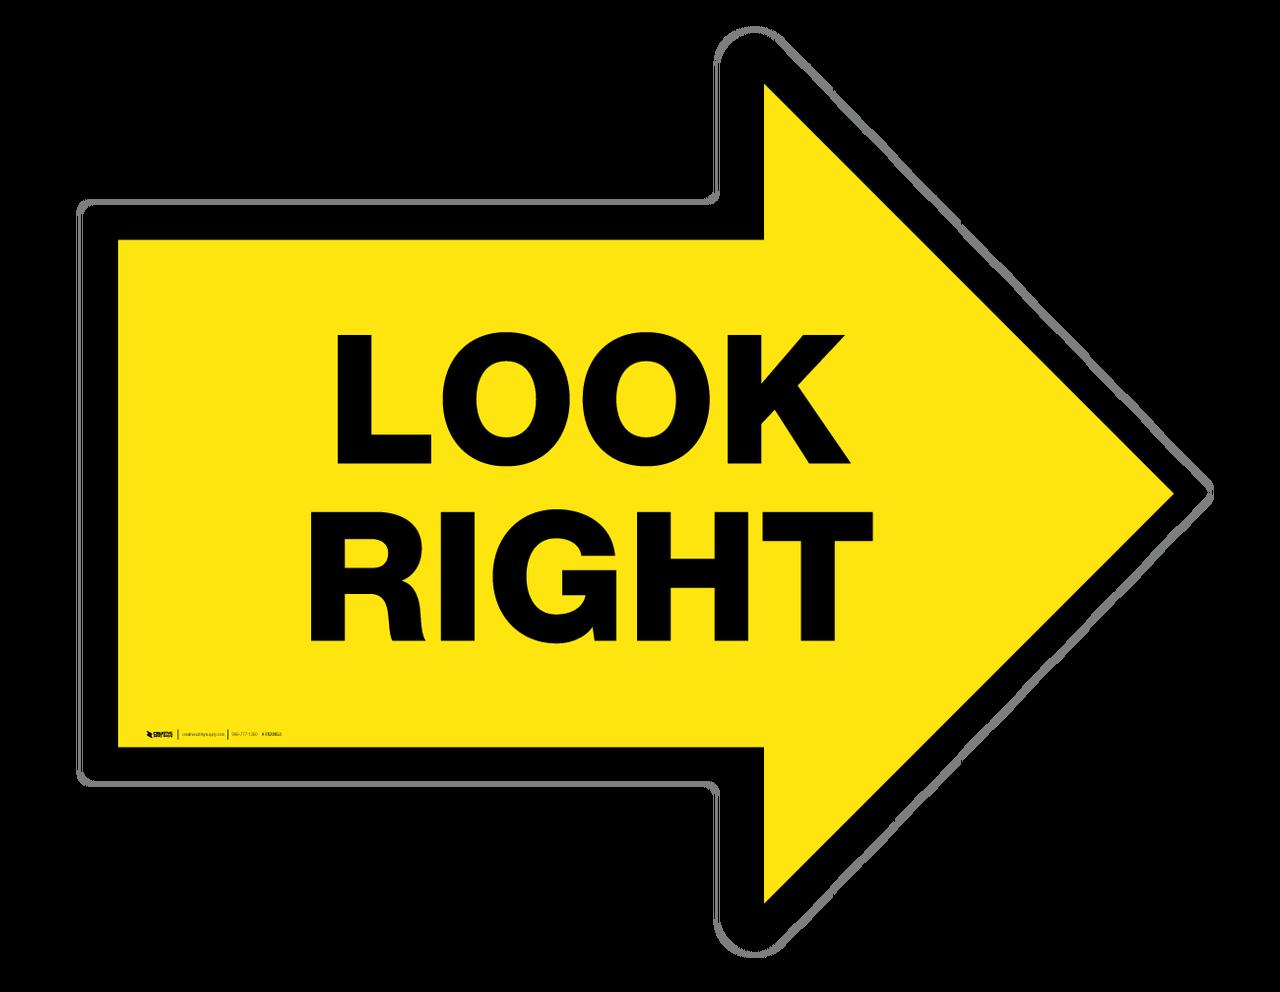 Stock market clip art jpg stock Stock market crash Copyright License Clip art - right arrow 1280*992 ... jpg stock